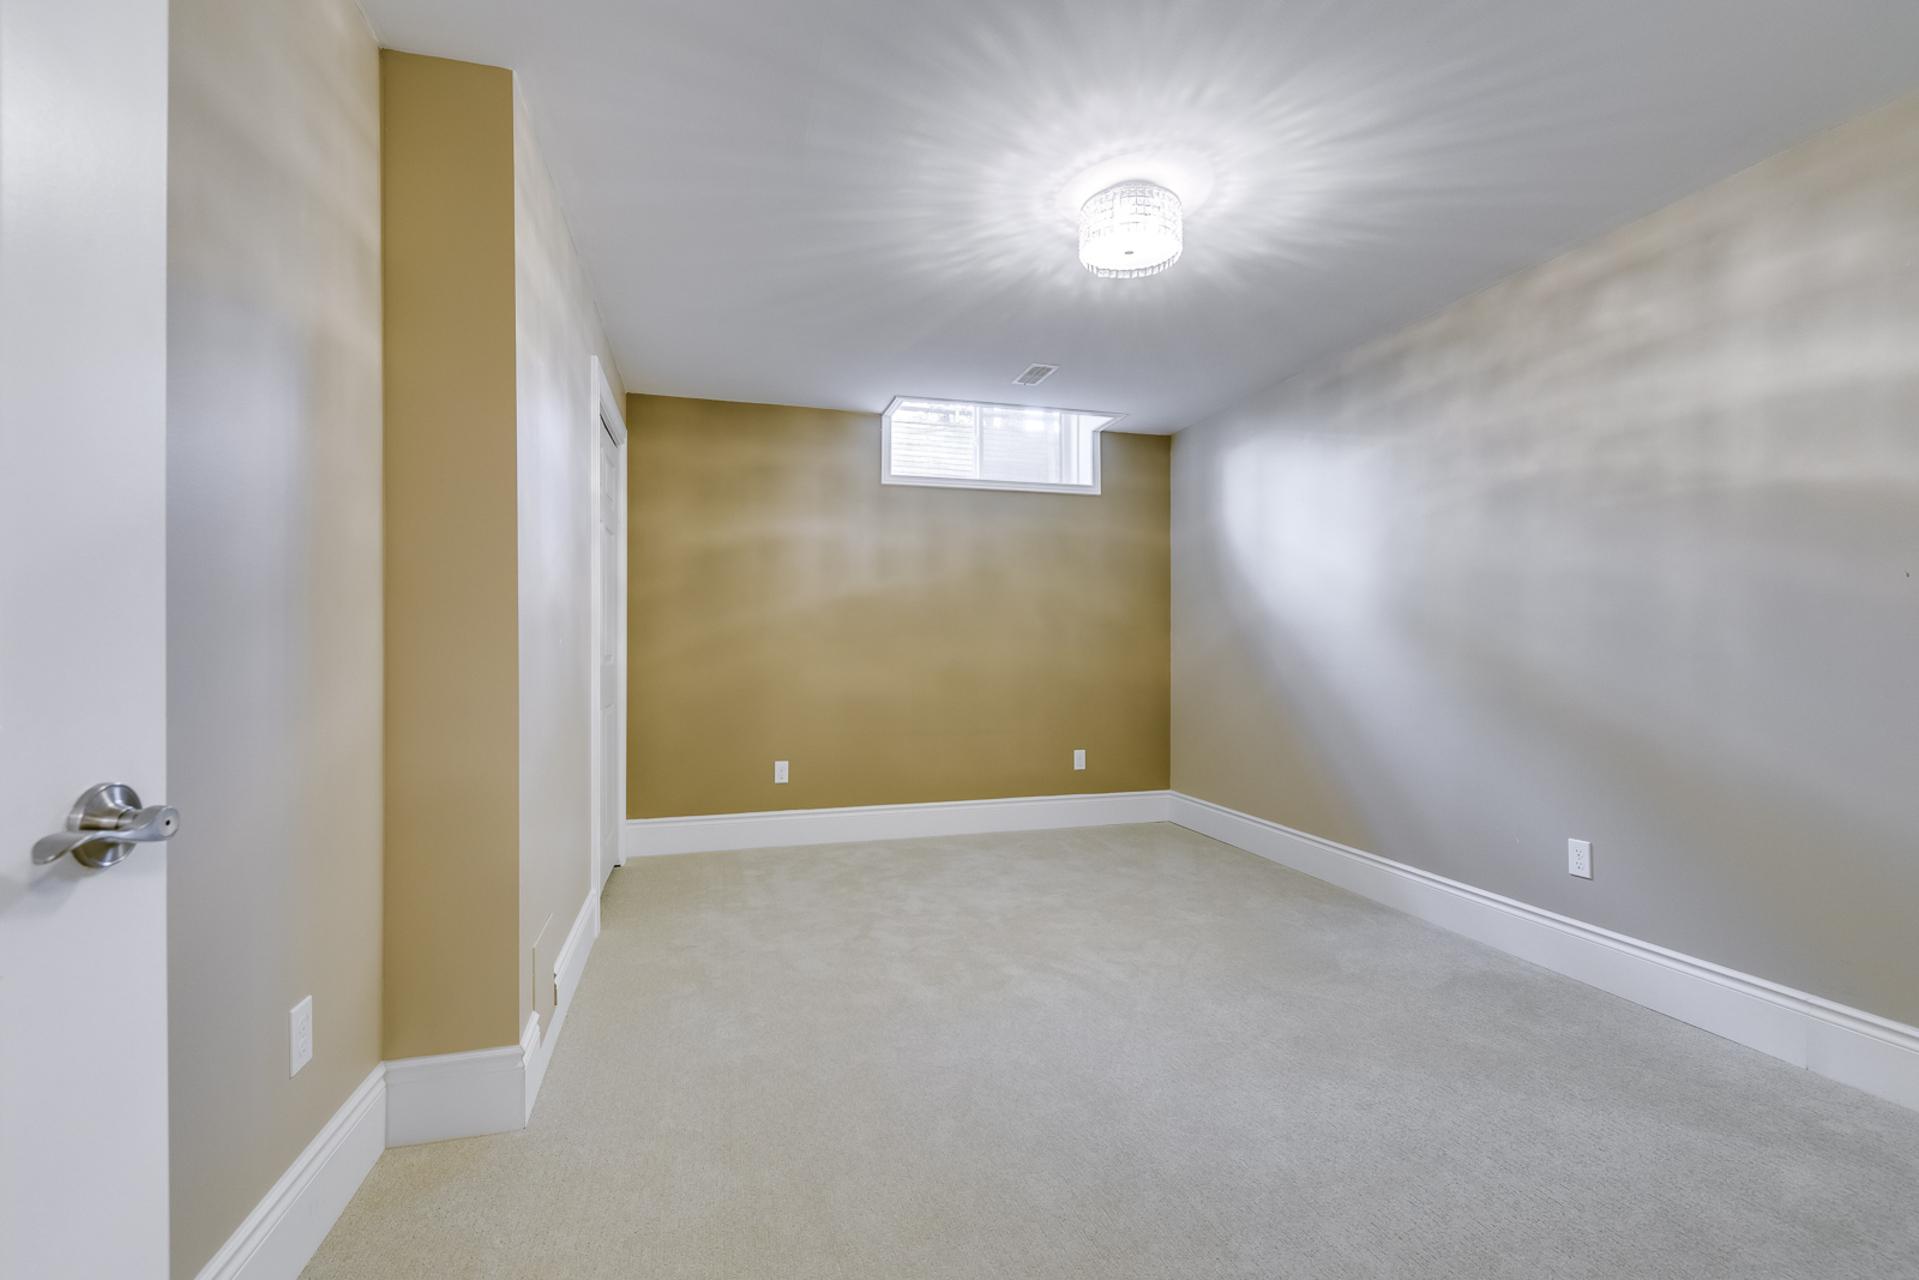 Basement - 5041 Lakeshore Rd, Burlington - Elite3 & Team at 5041 Lakeshore Road, Appleby, Burlington